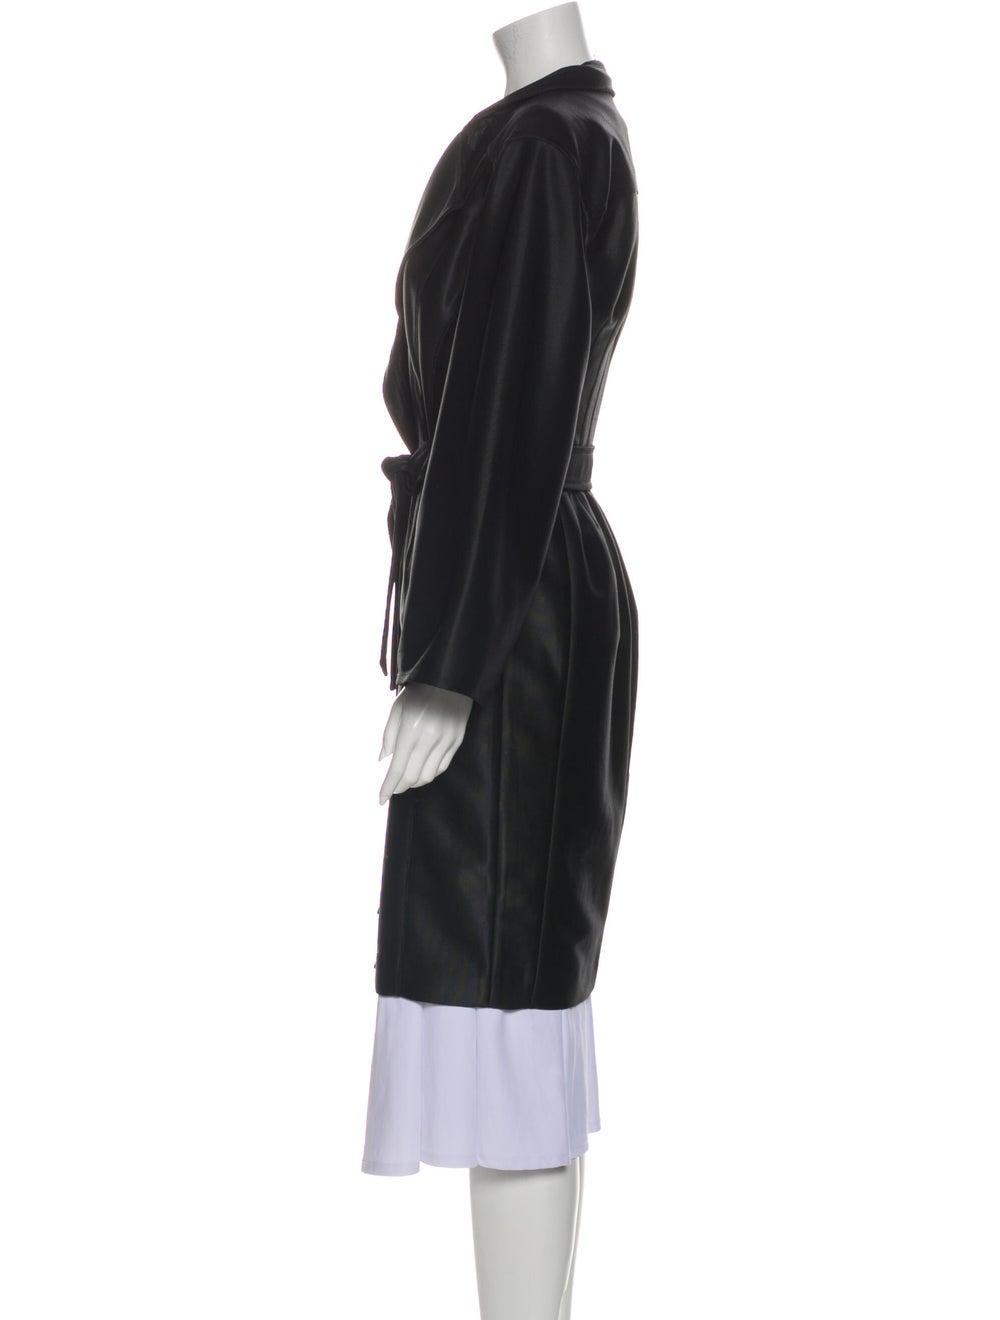 Balenciaga Coat Black - image 2